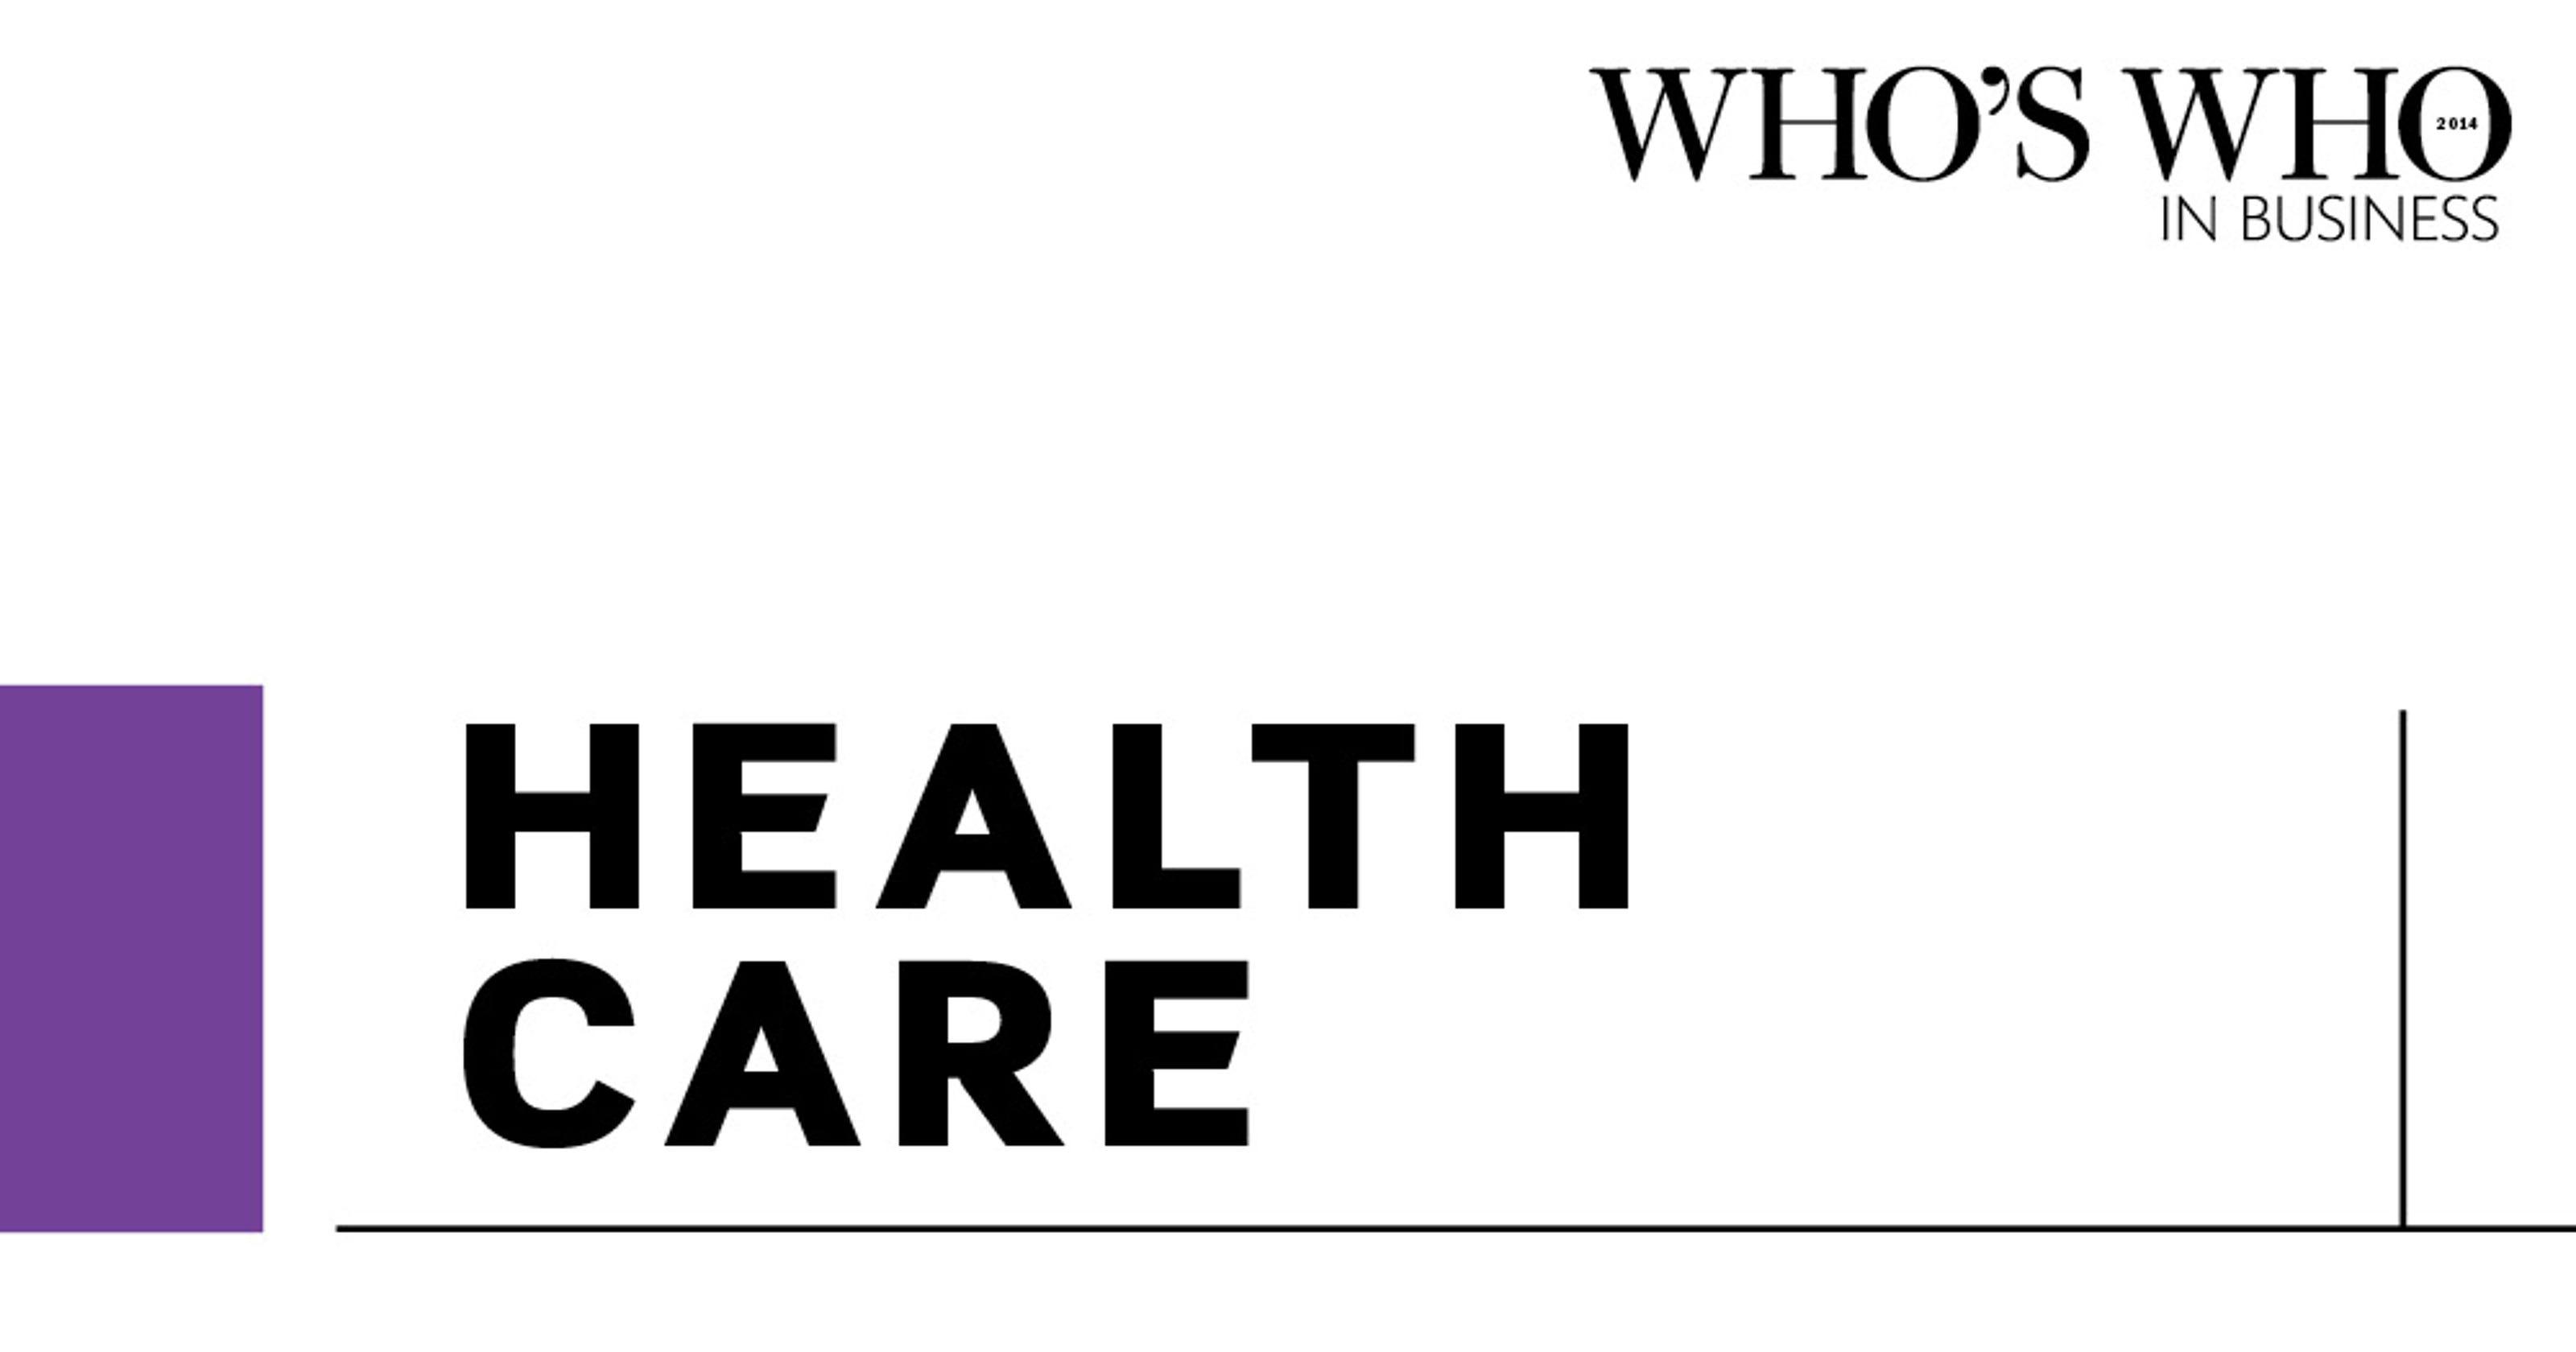 Top 10 Arizona companies: Health insurers